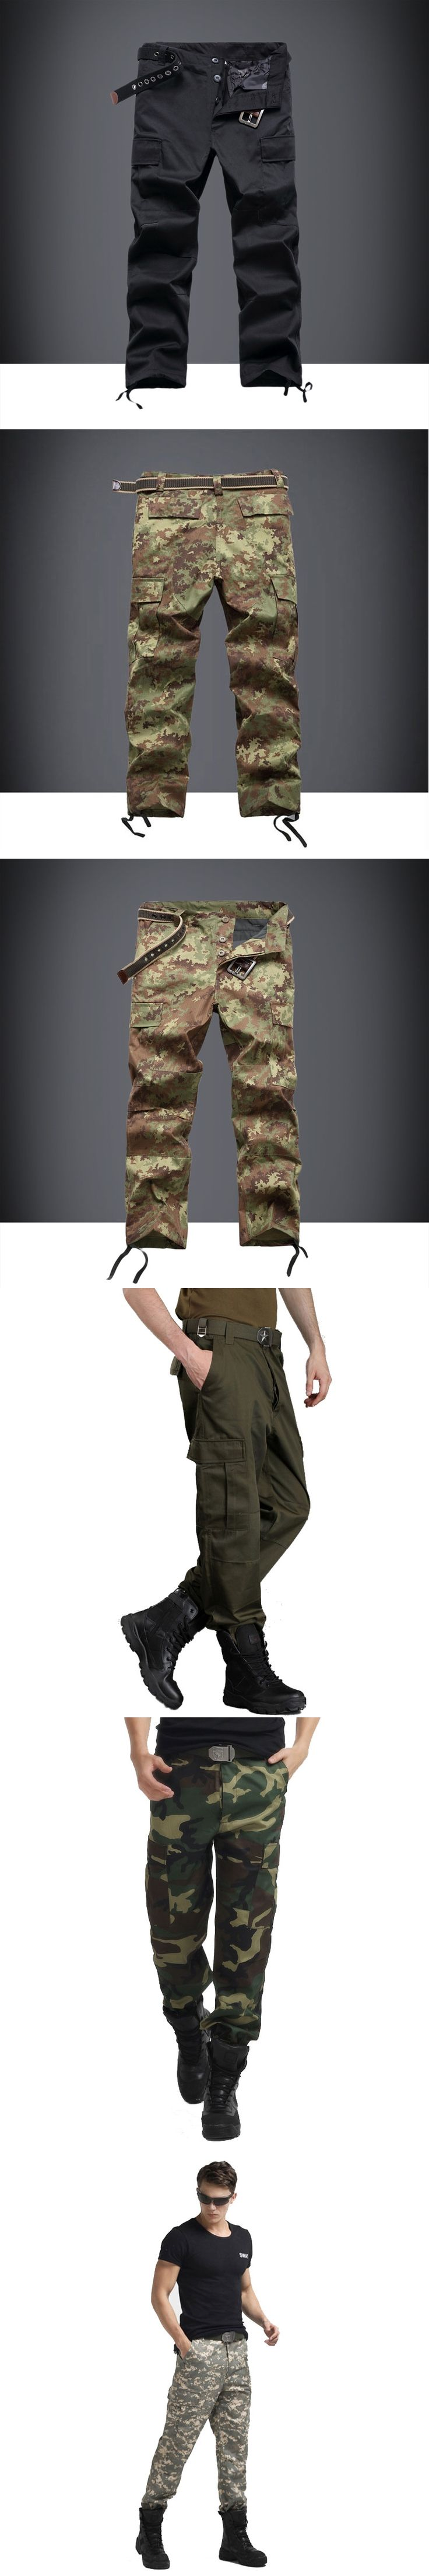 Military Tactical Pants Men Army Active SWAT Camo Cargo Pants Men Jogger Pantalon Homme Sweatpants Casual Cargo Trousers